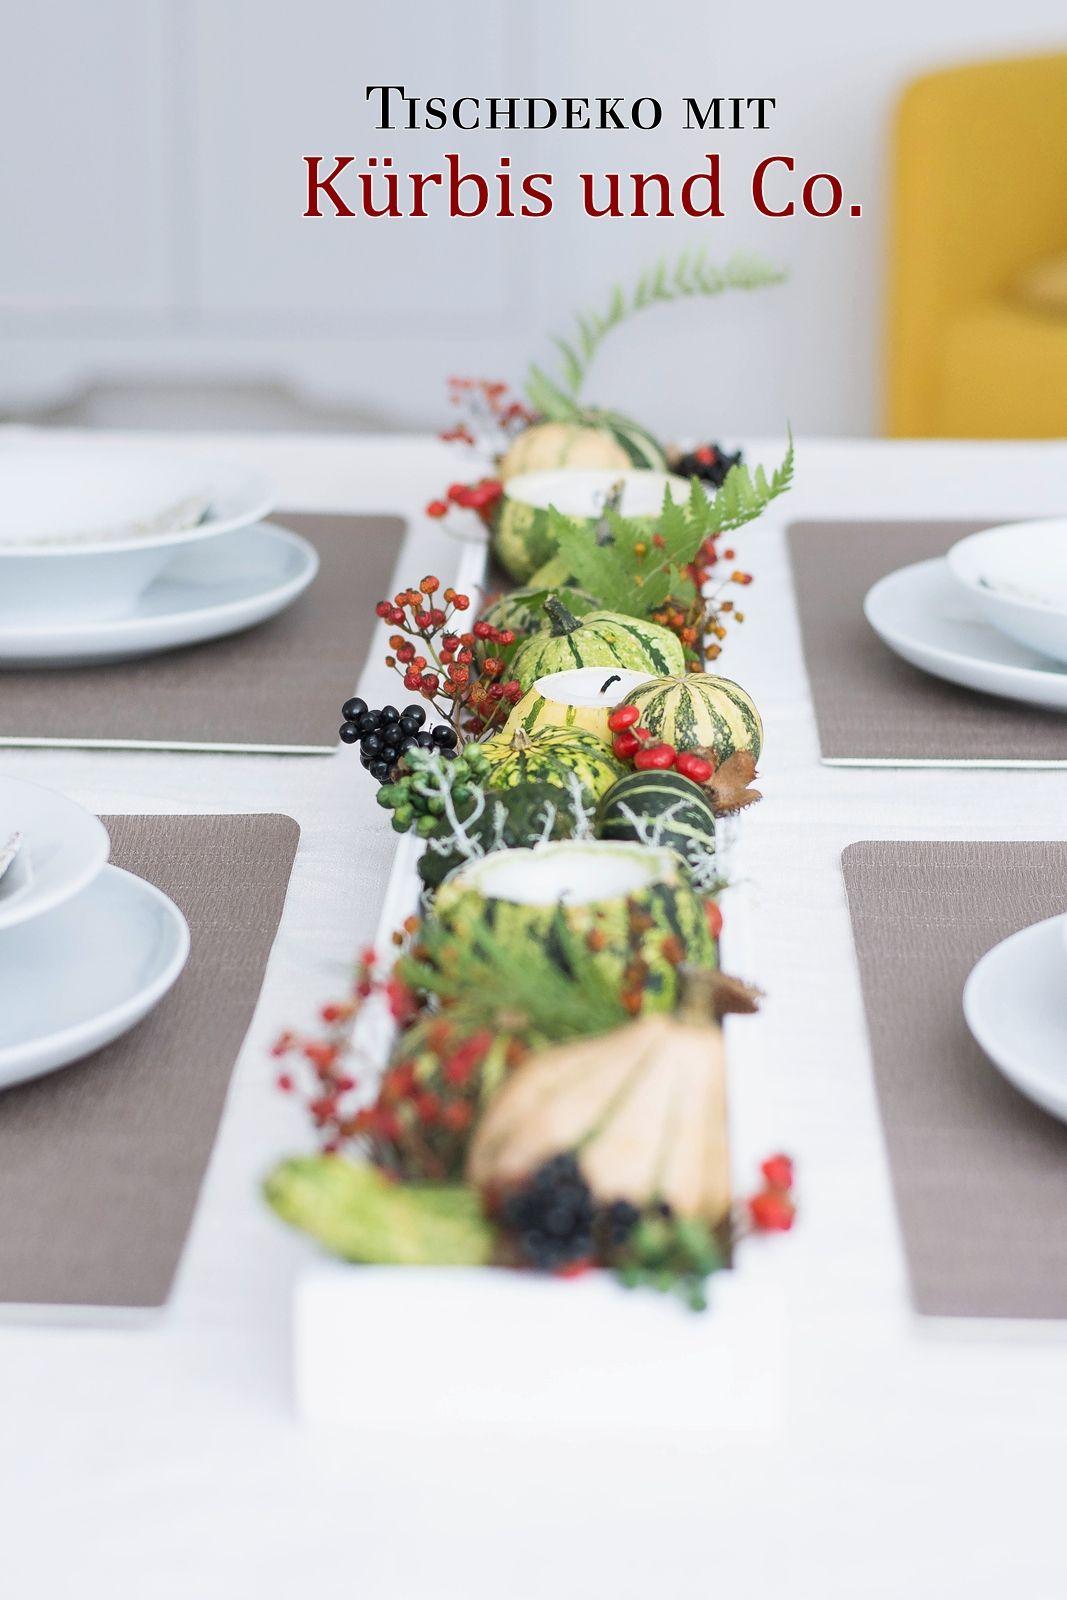 Tischdeko mit selbstgemachten Kürbiskerzen